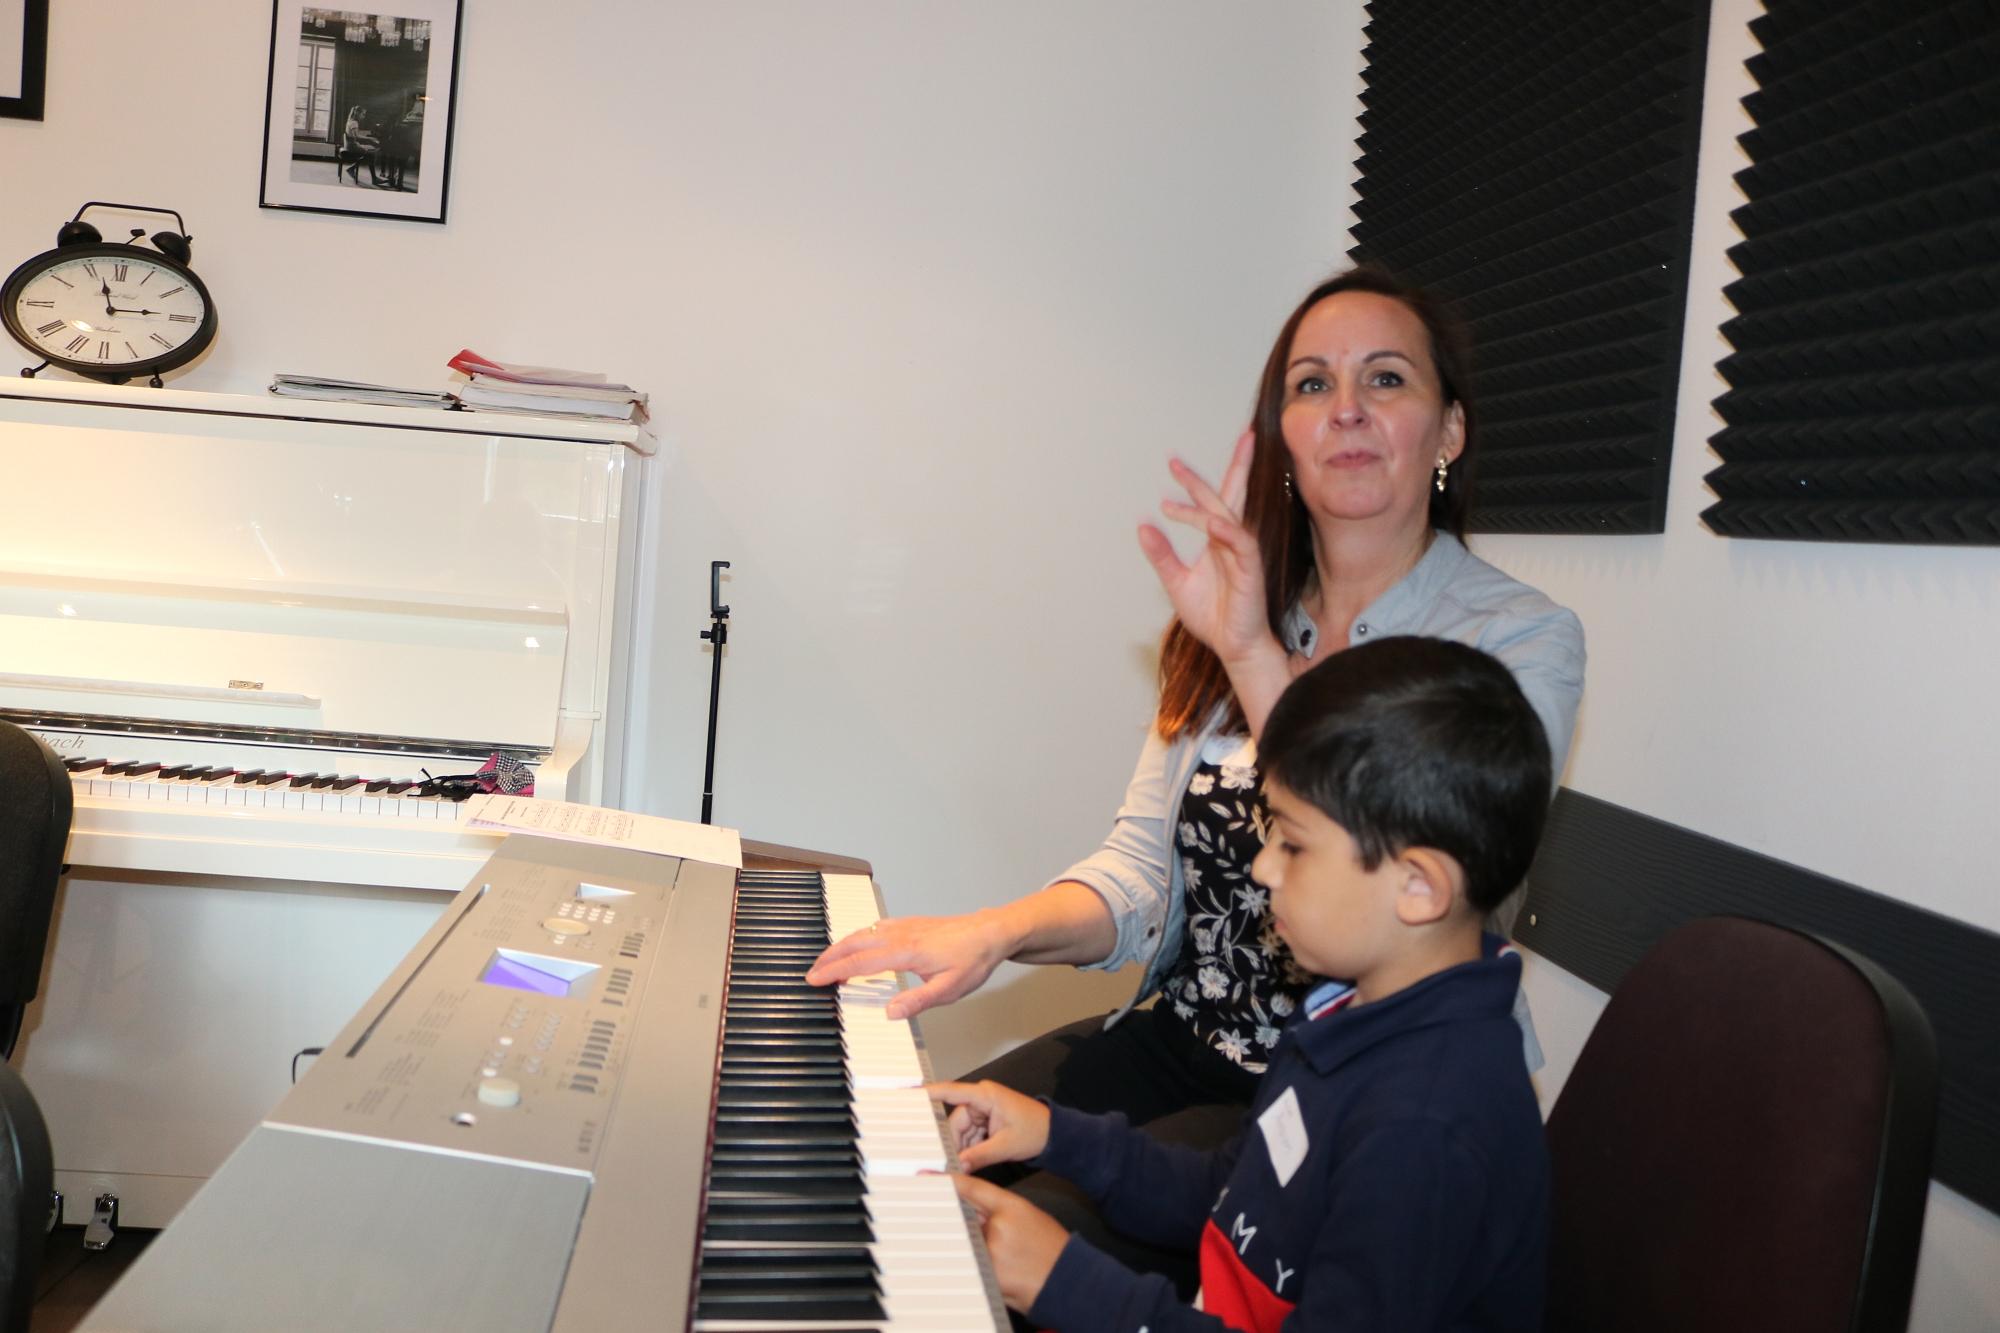 202007 Bandprobe FP Musikschule Harmonie 9